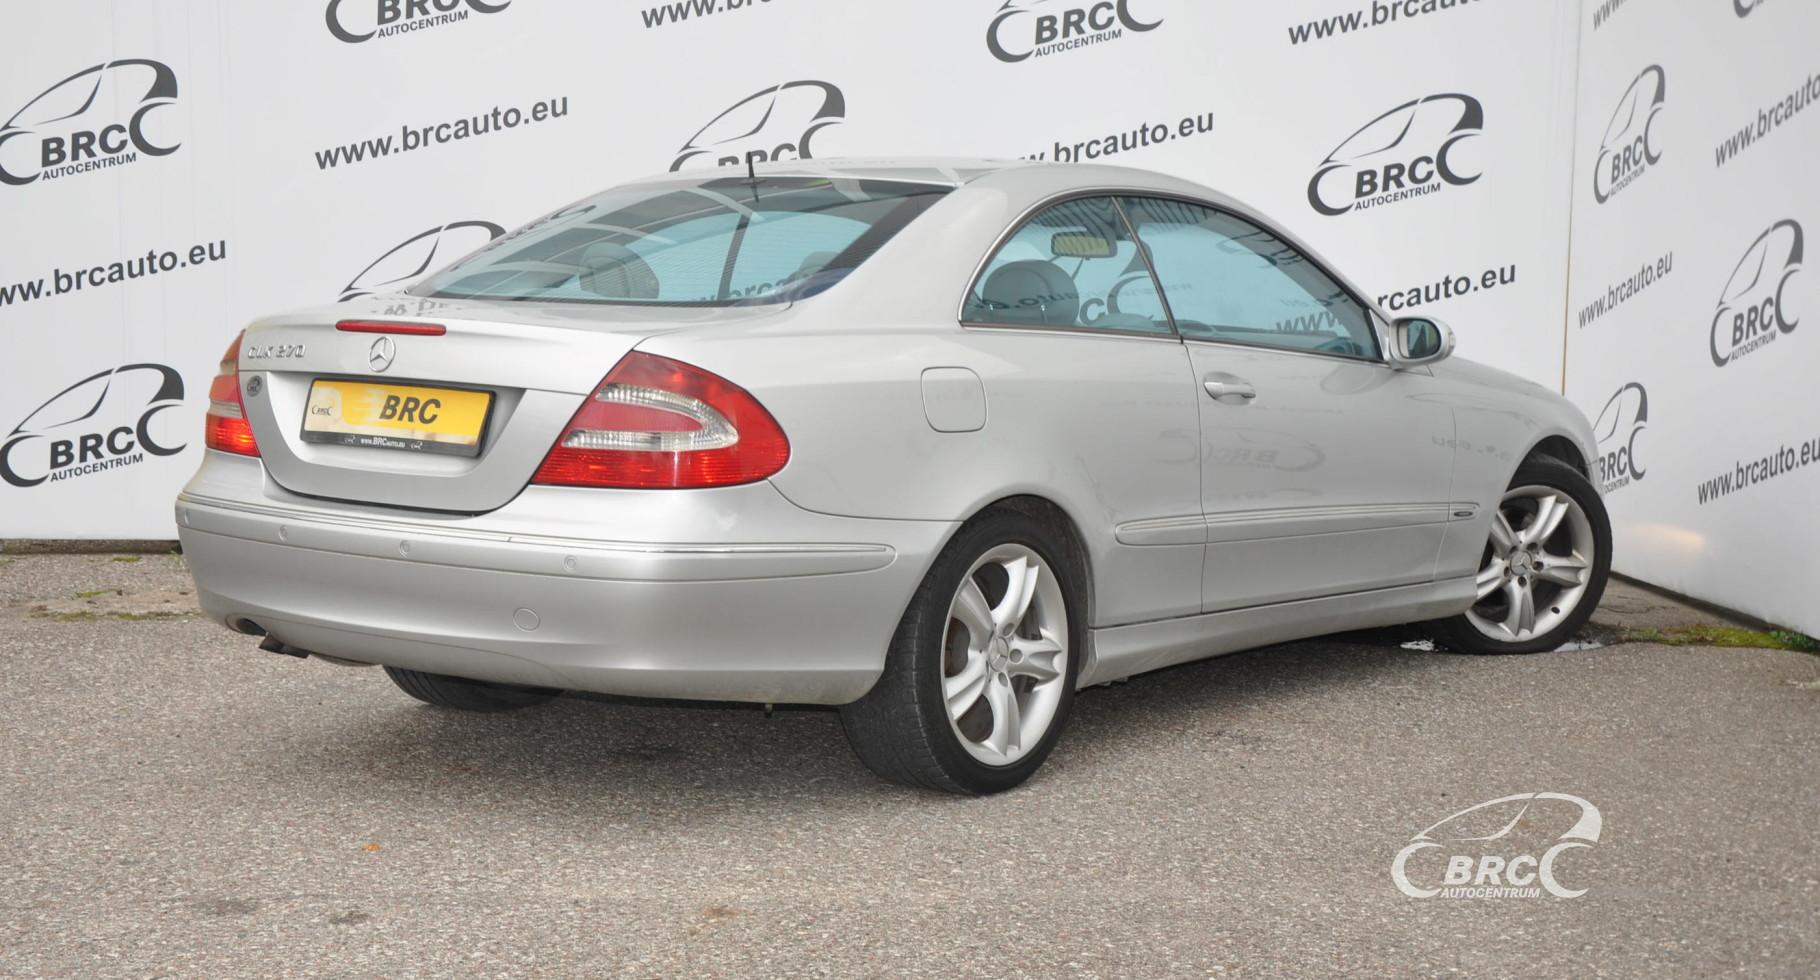 Mercedes-Benz CLK 270 CDI Avantgarde Automatas